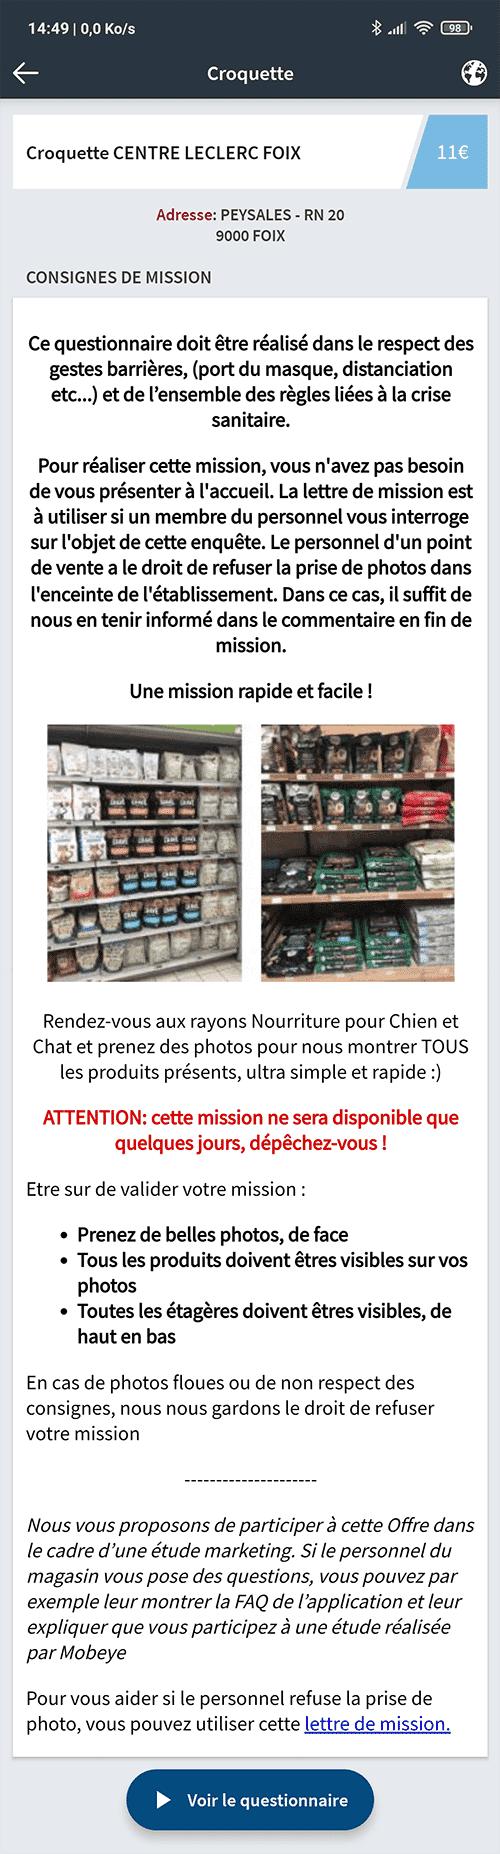 Exemple mission Mobeye Leclerc croquettes